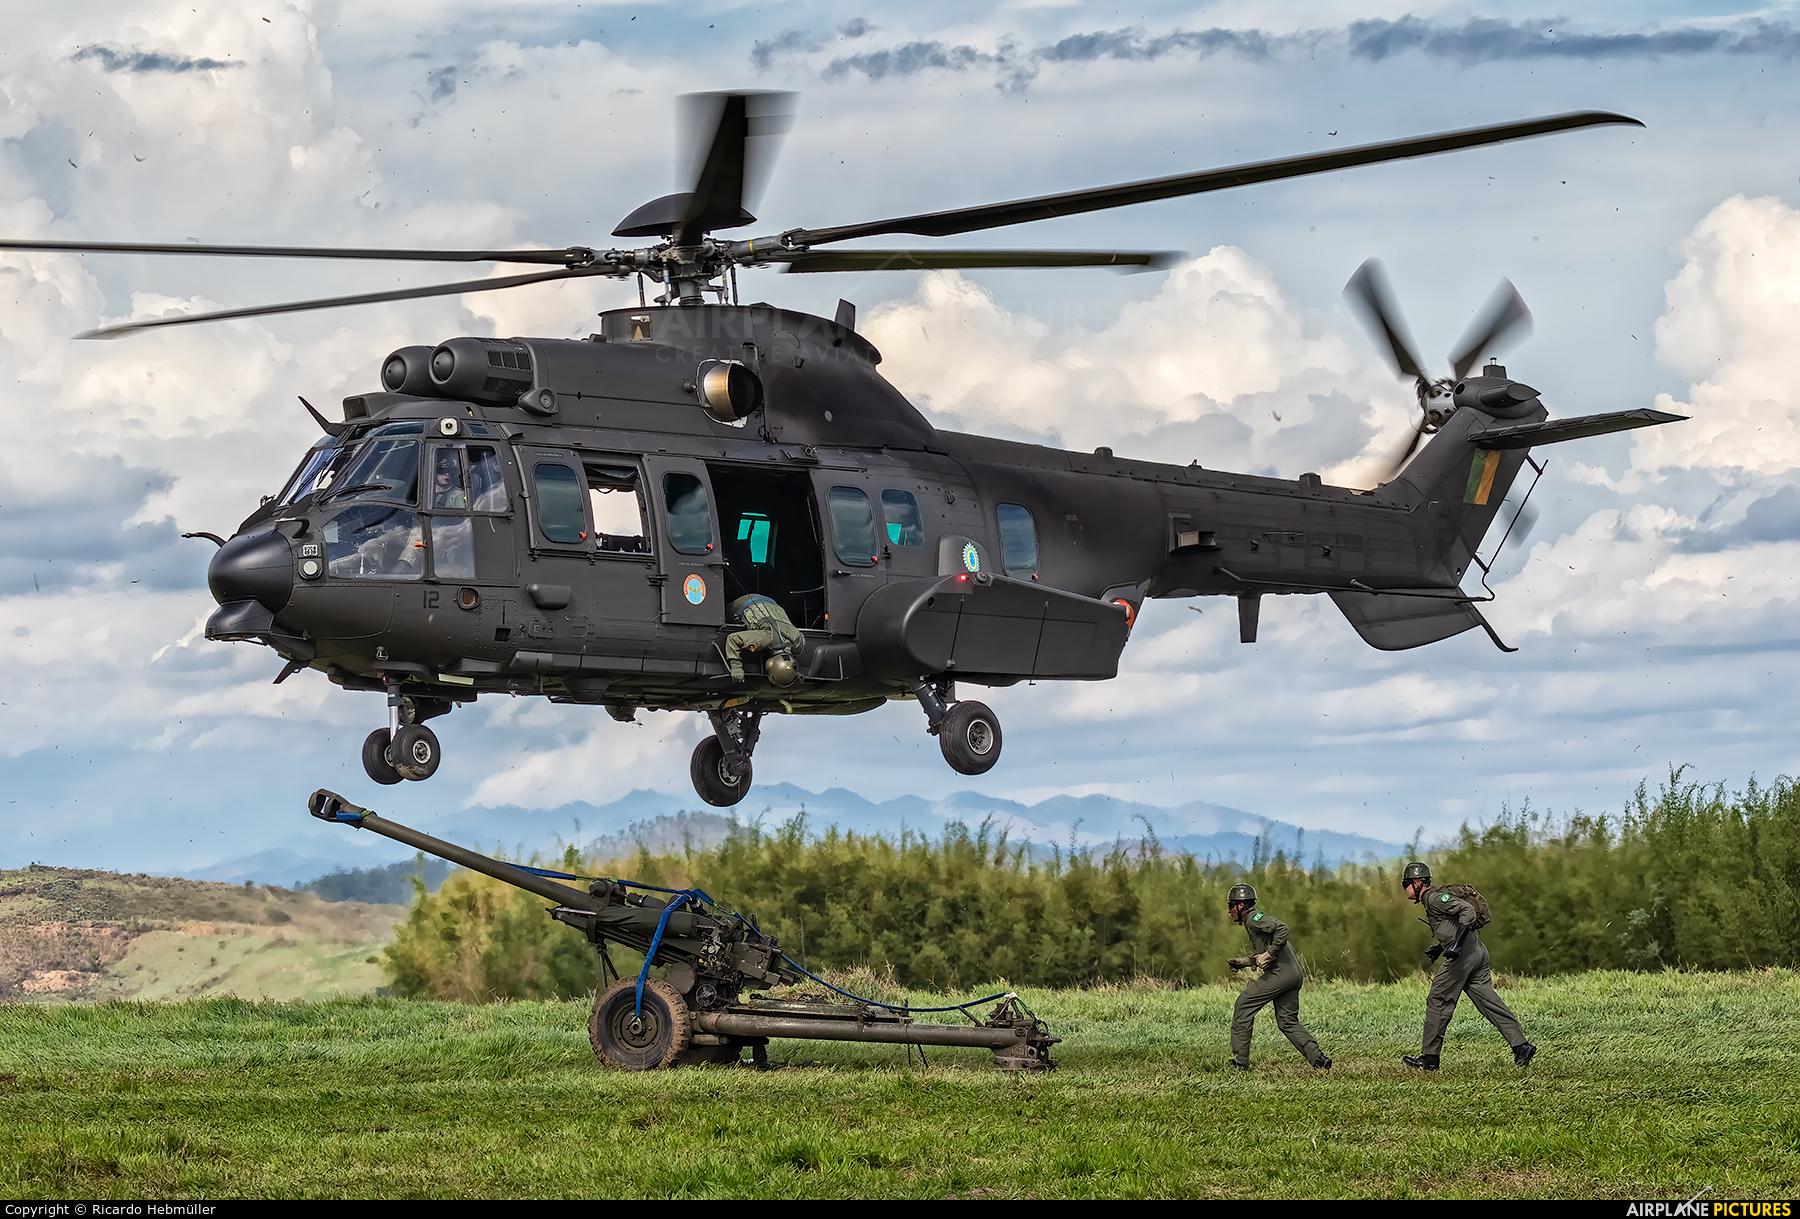 Brazil - Army 5012 aircraft at Resende